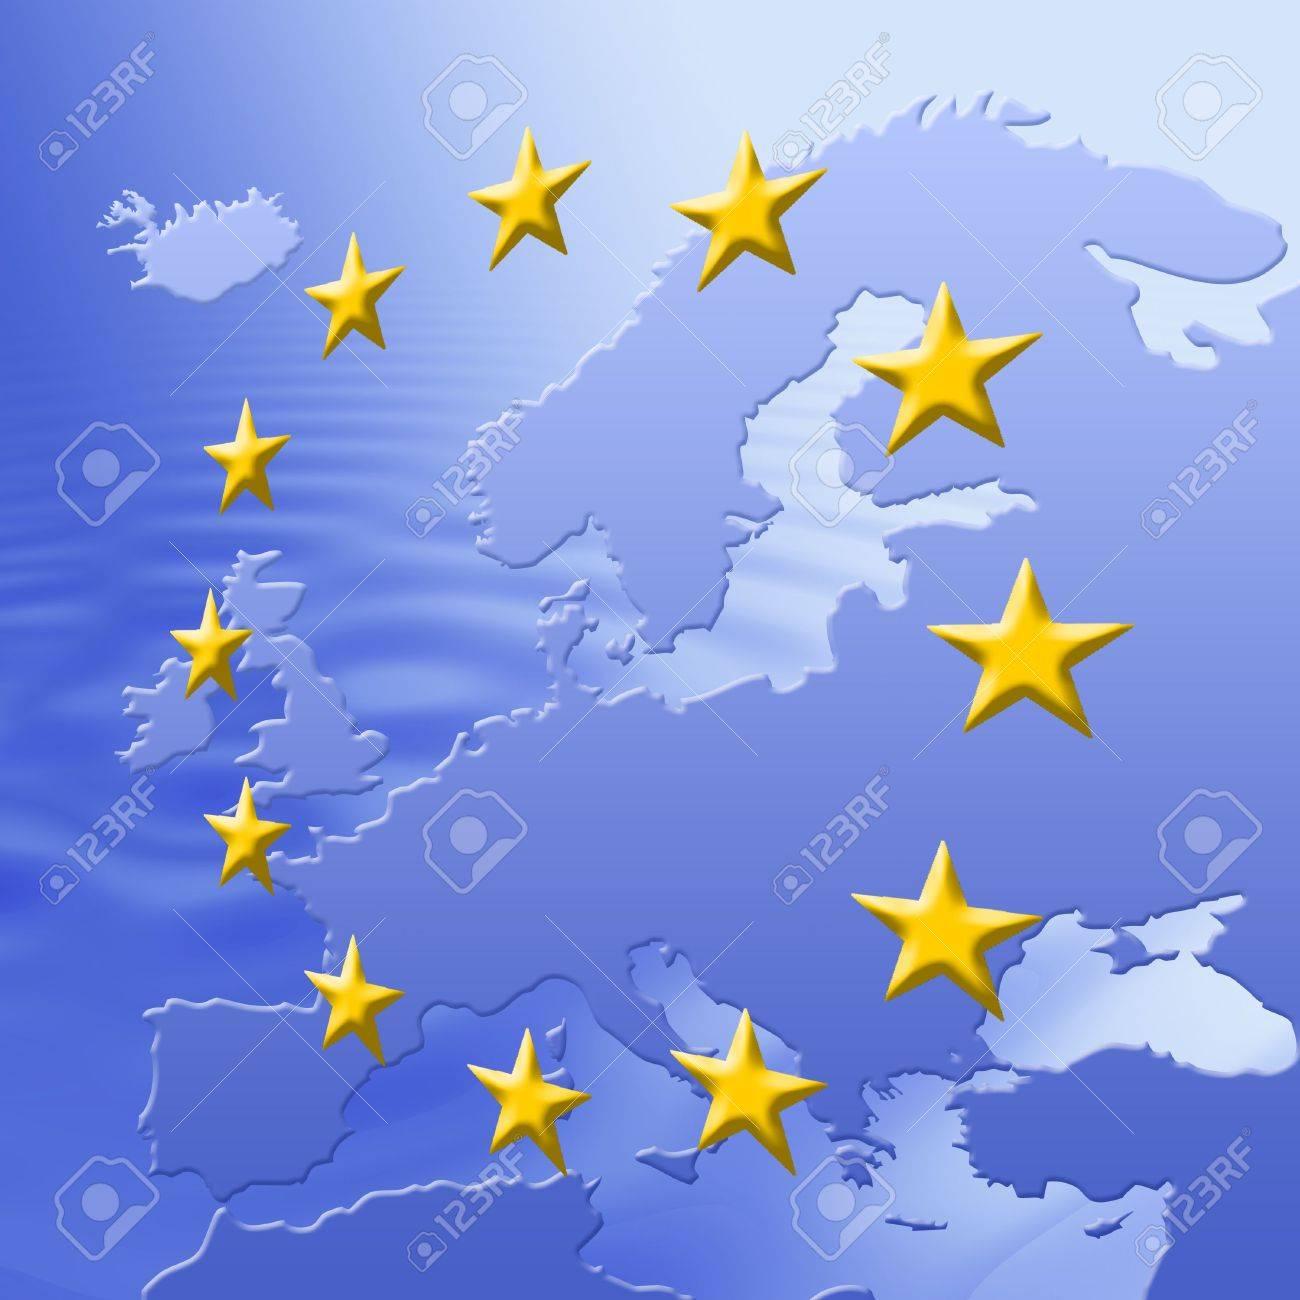 Continent Of Europe Map With EU Stars, Symbolic Illustration of European Union Stock Photo - 3180519